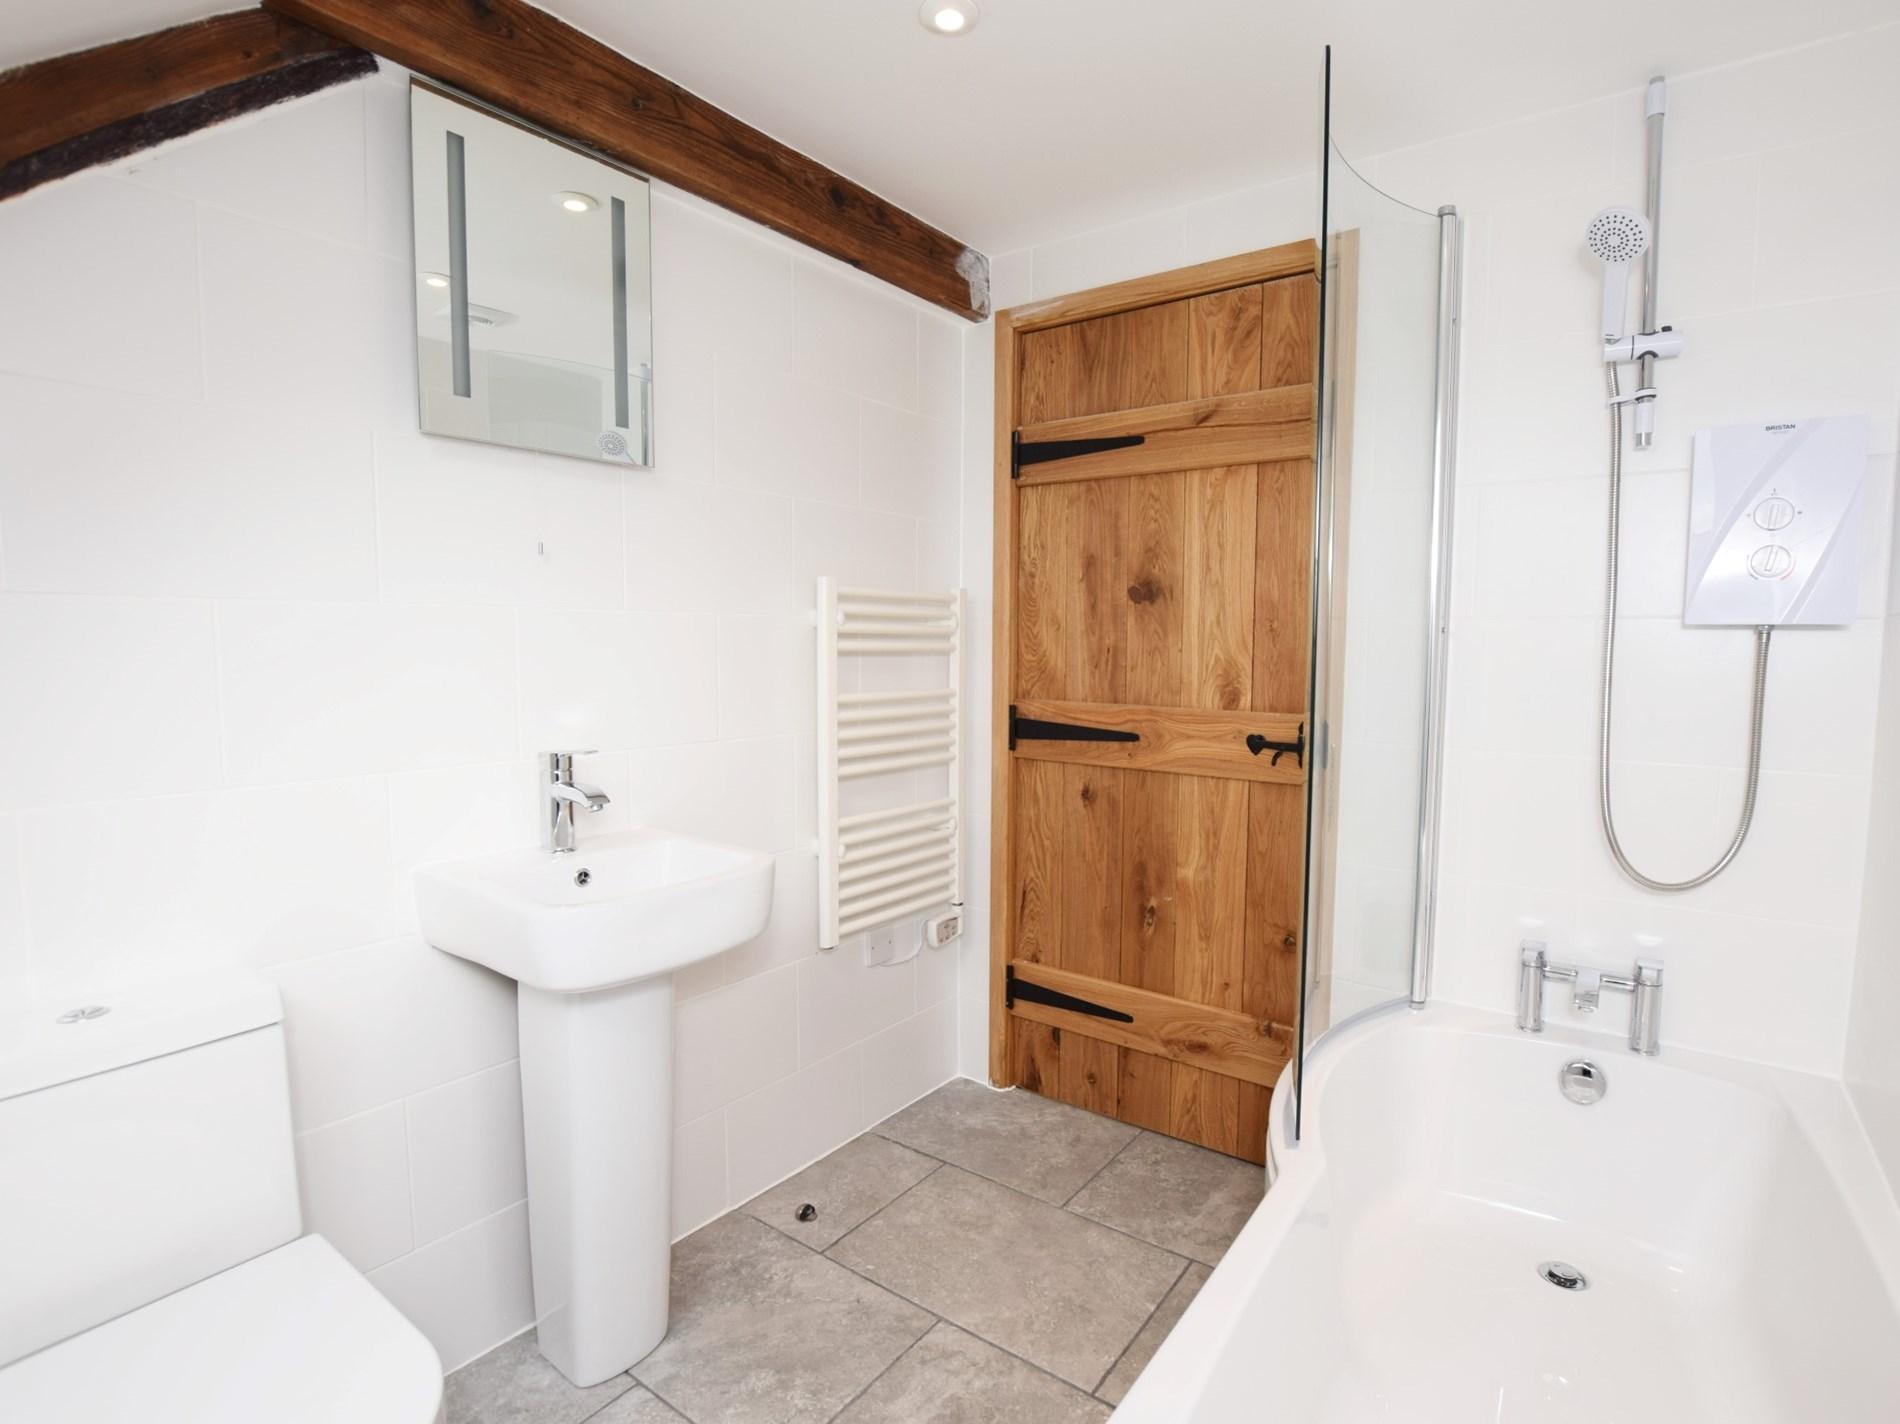 4 Bedroom Cottage in Ilfracombe, Devon